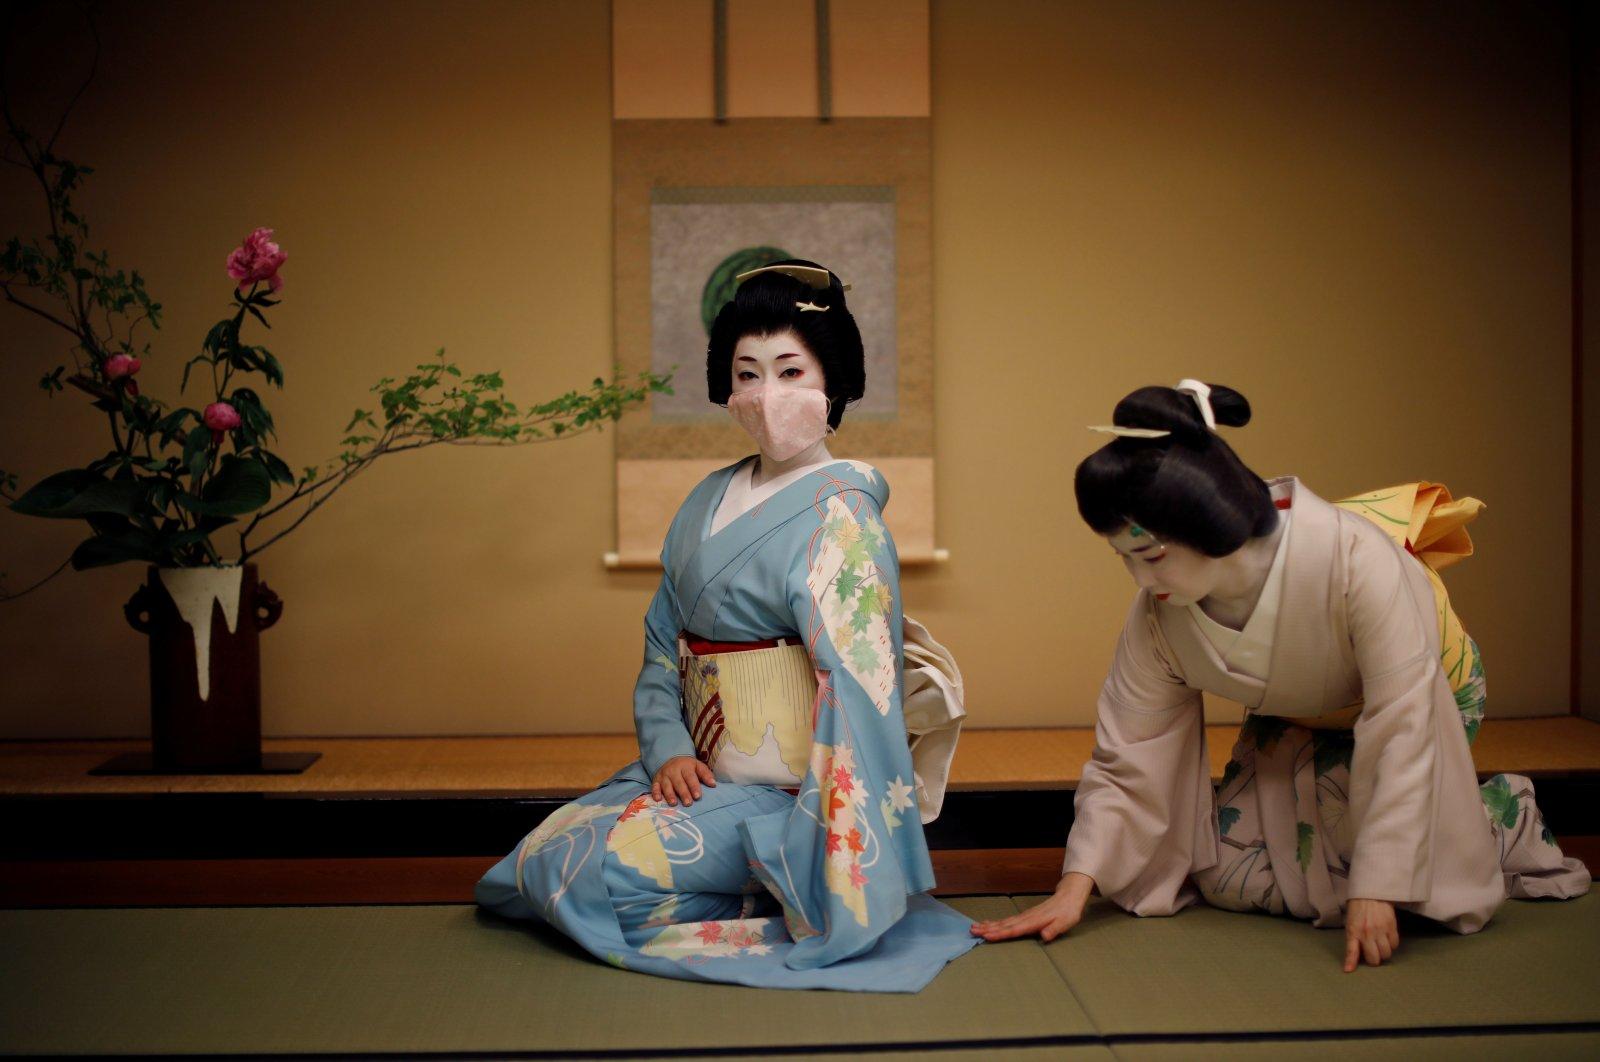 Mayu adjusts Koiku's kimono as Koiku wears a protective face mask to pose for a photograph at a luxury Japanese restaurant, Tokyo, Japan, June 23, 2020. (Reuters Photo)